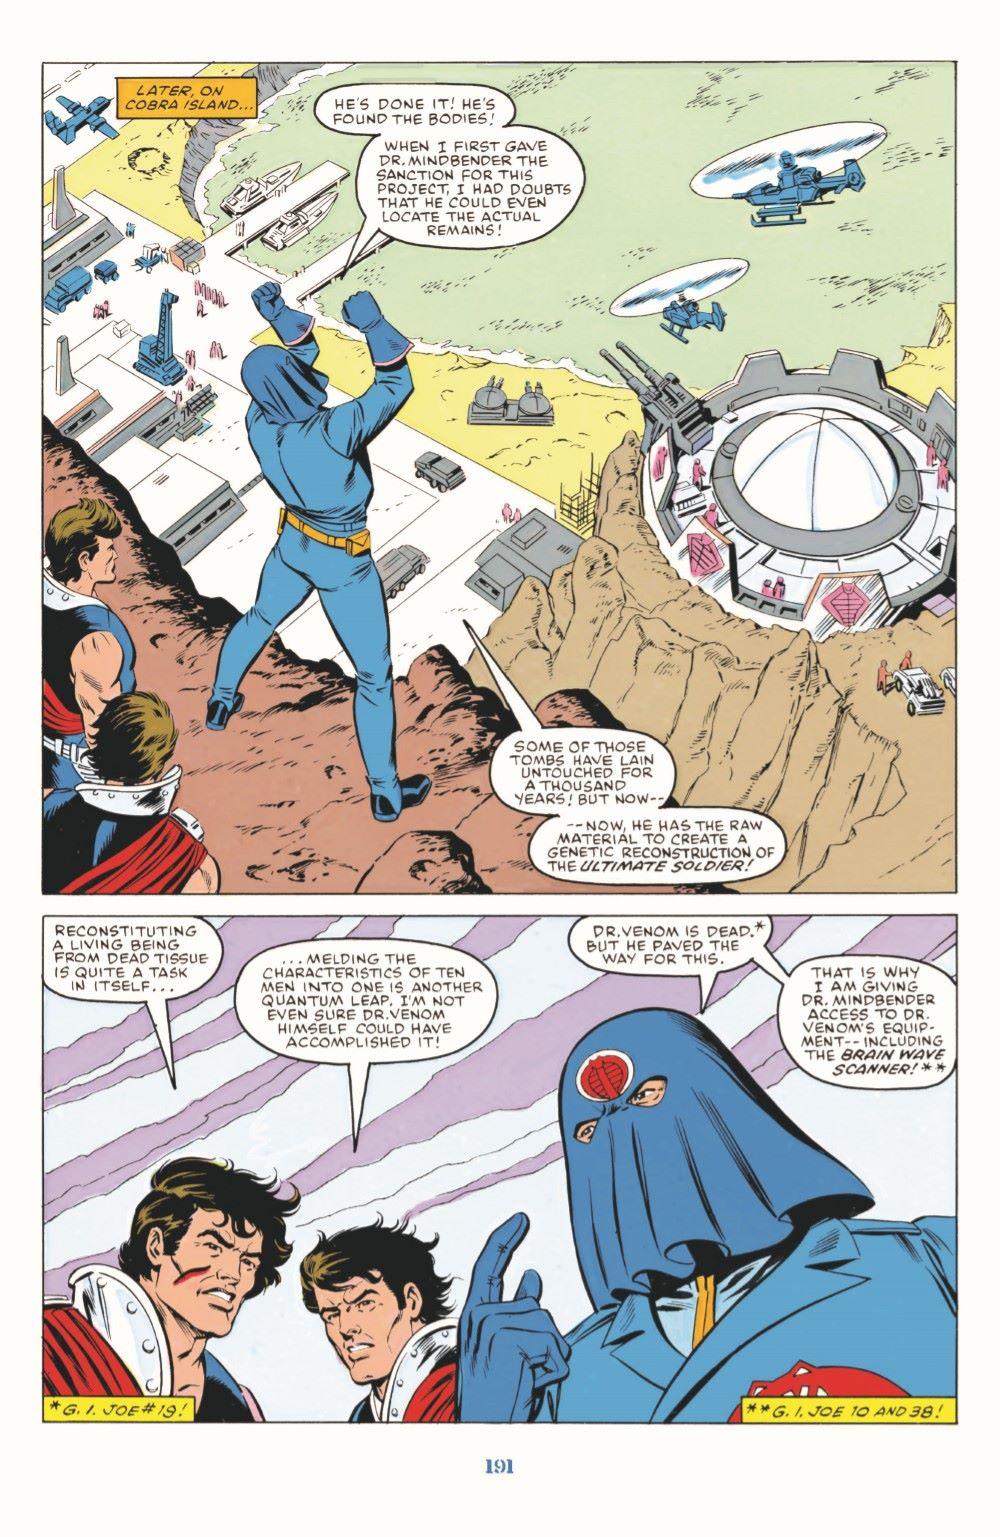 GIJoeRAH_SerpentorUncoiled-pr-06 ComicList Previews: G.I. JOE A REAL AMERICAN HERO SERPENTOR UNCOILED #1